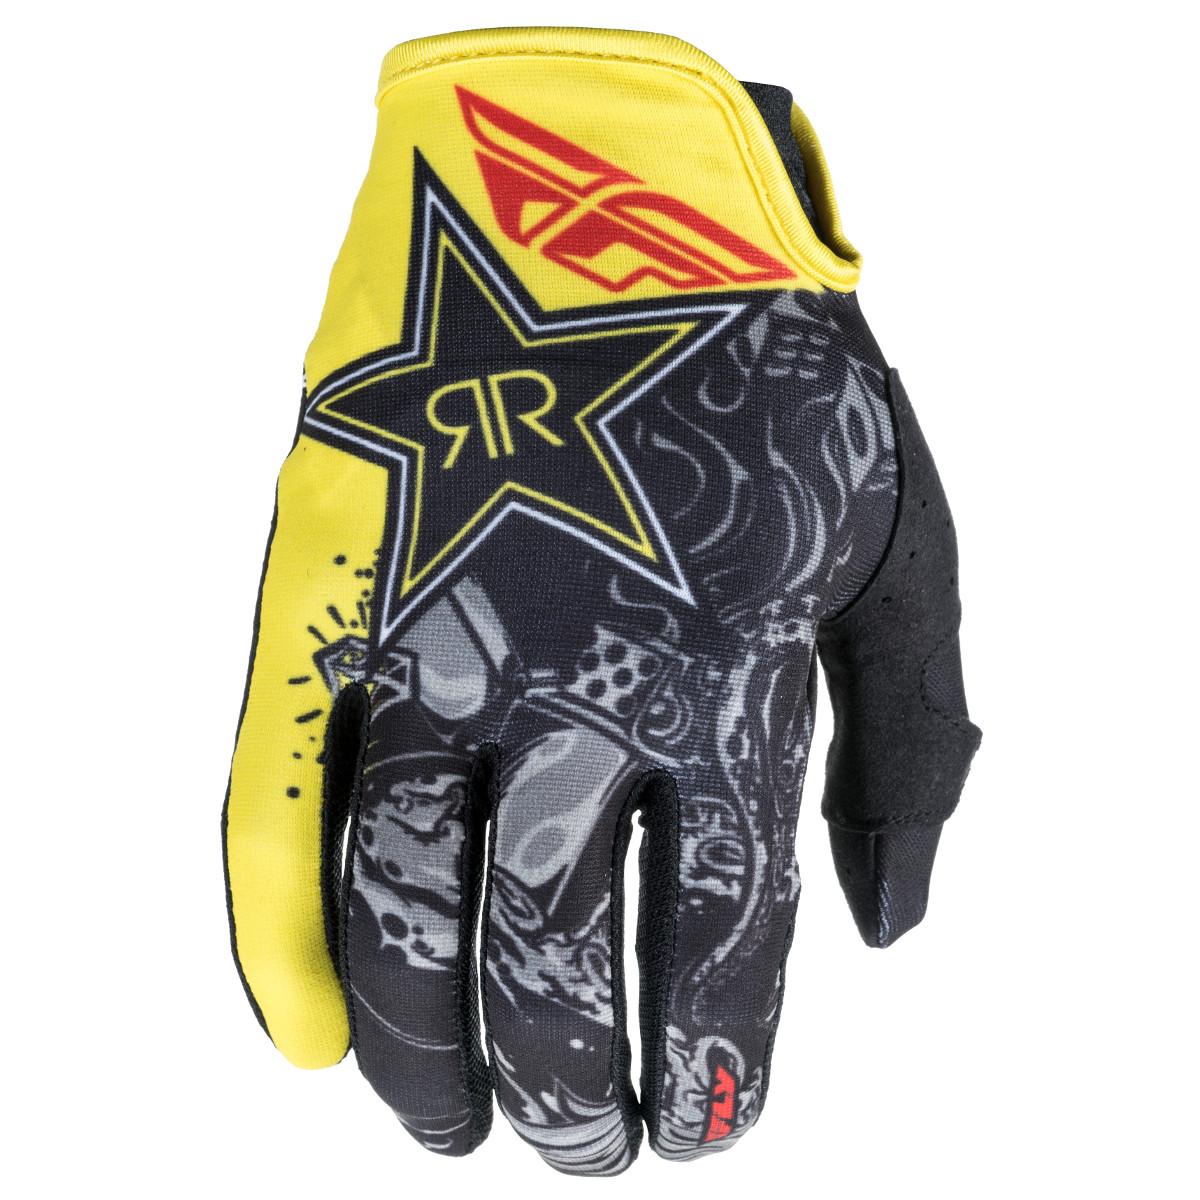 Fly Racing Handschuhe Lite Rockstar Schwarz/Gelb